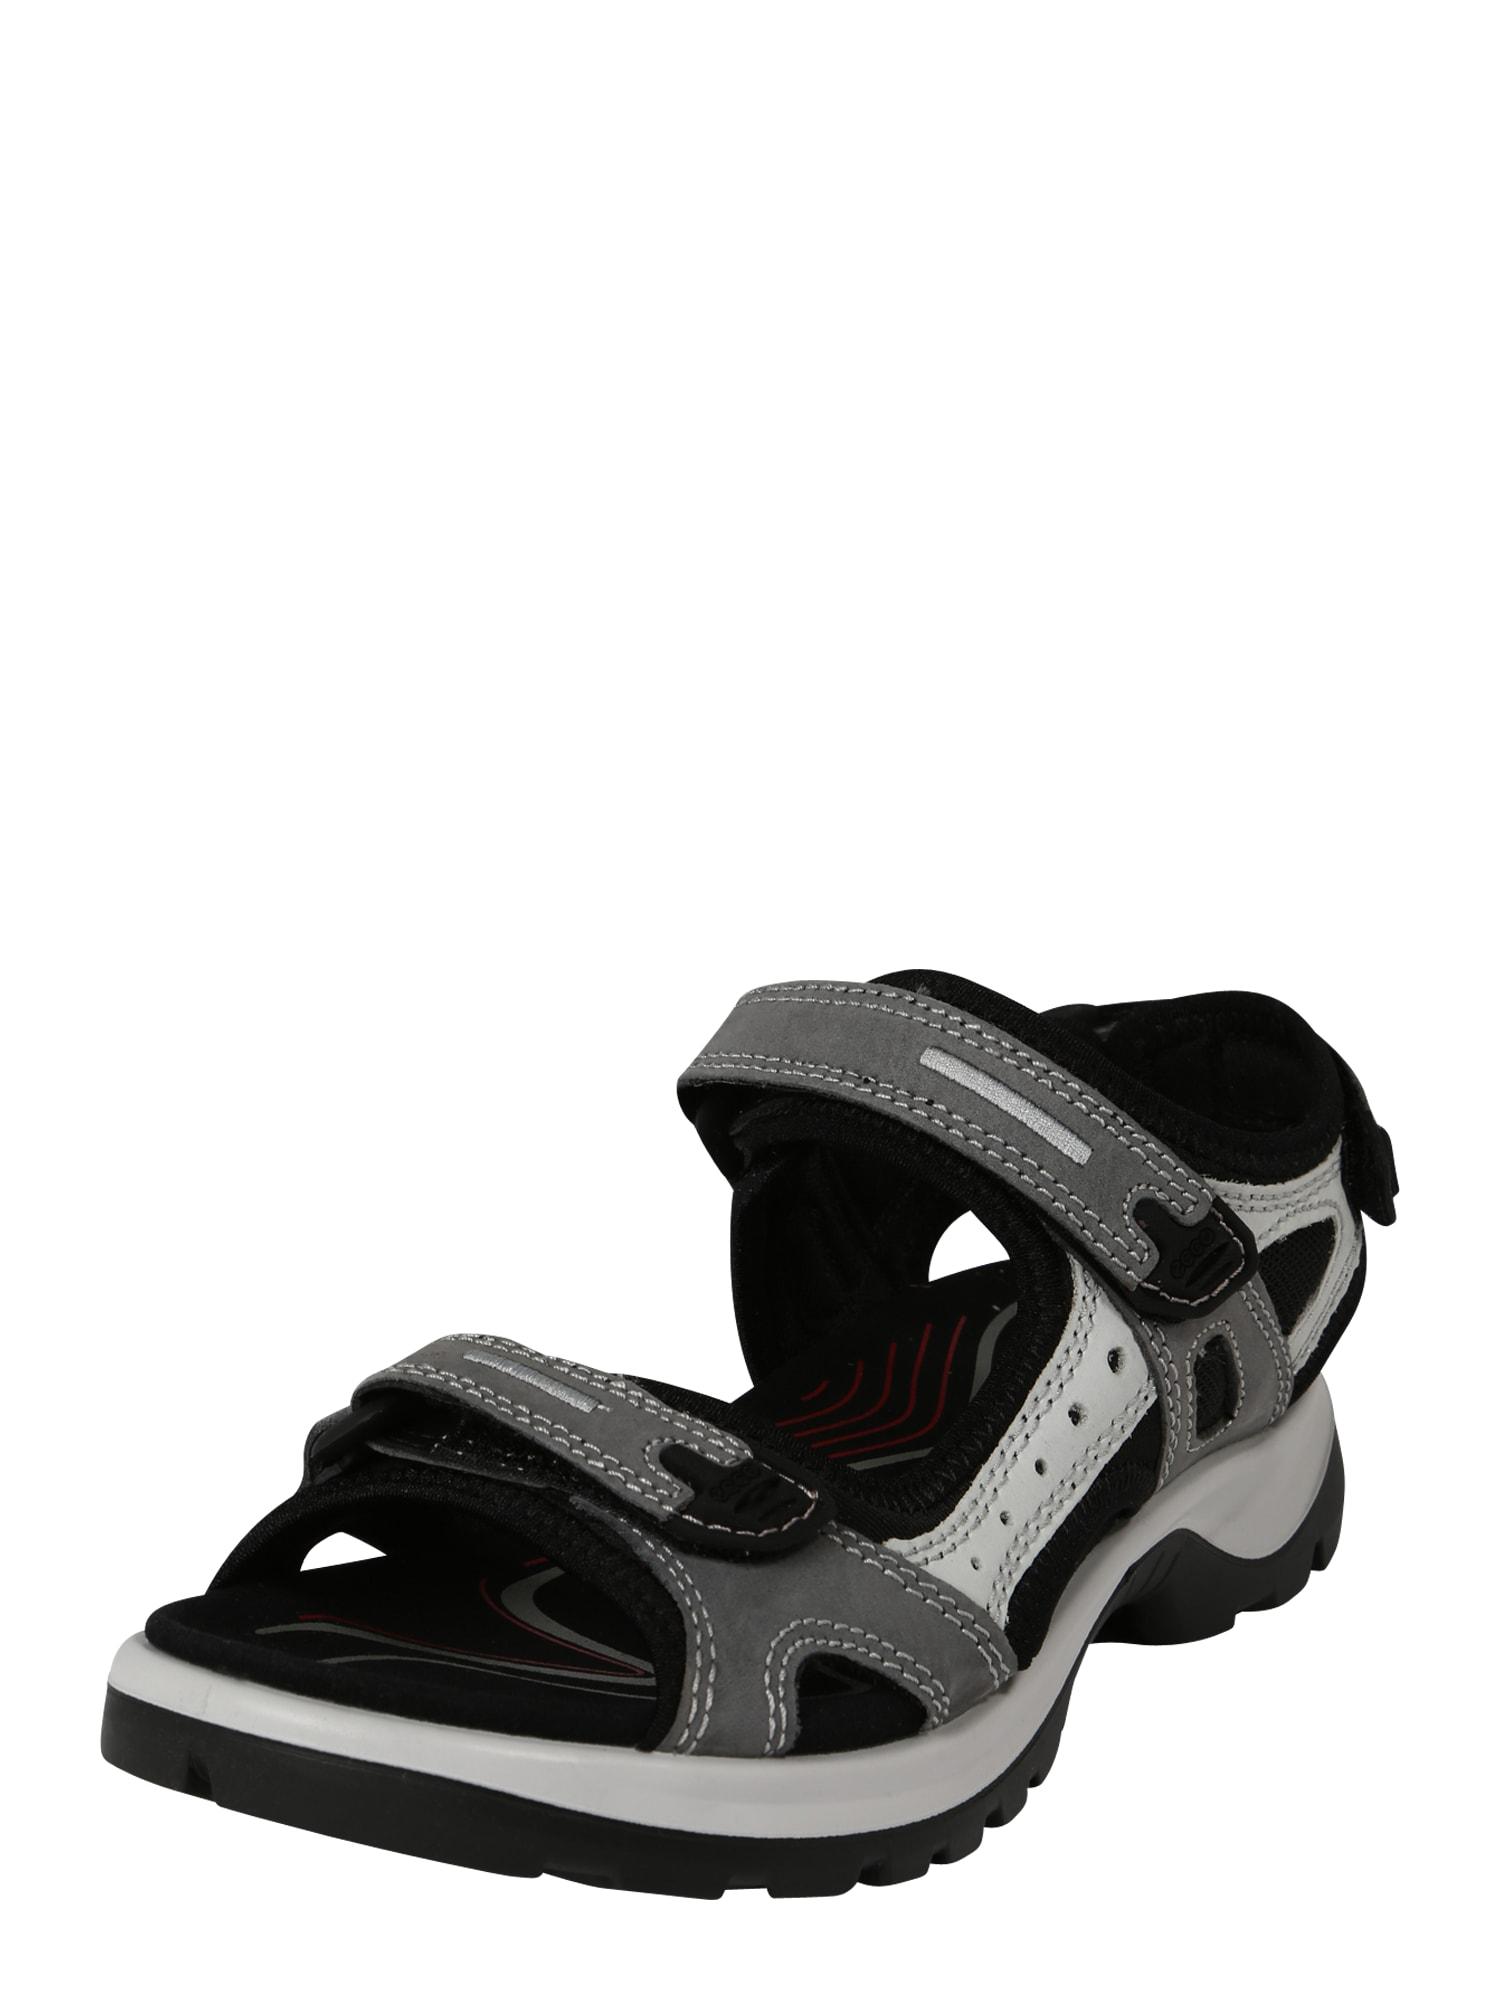 ECCO Sportinio tipo sandalai pilka / juoda